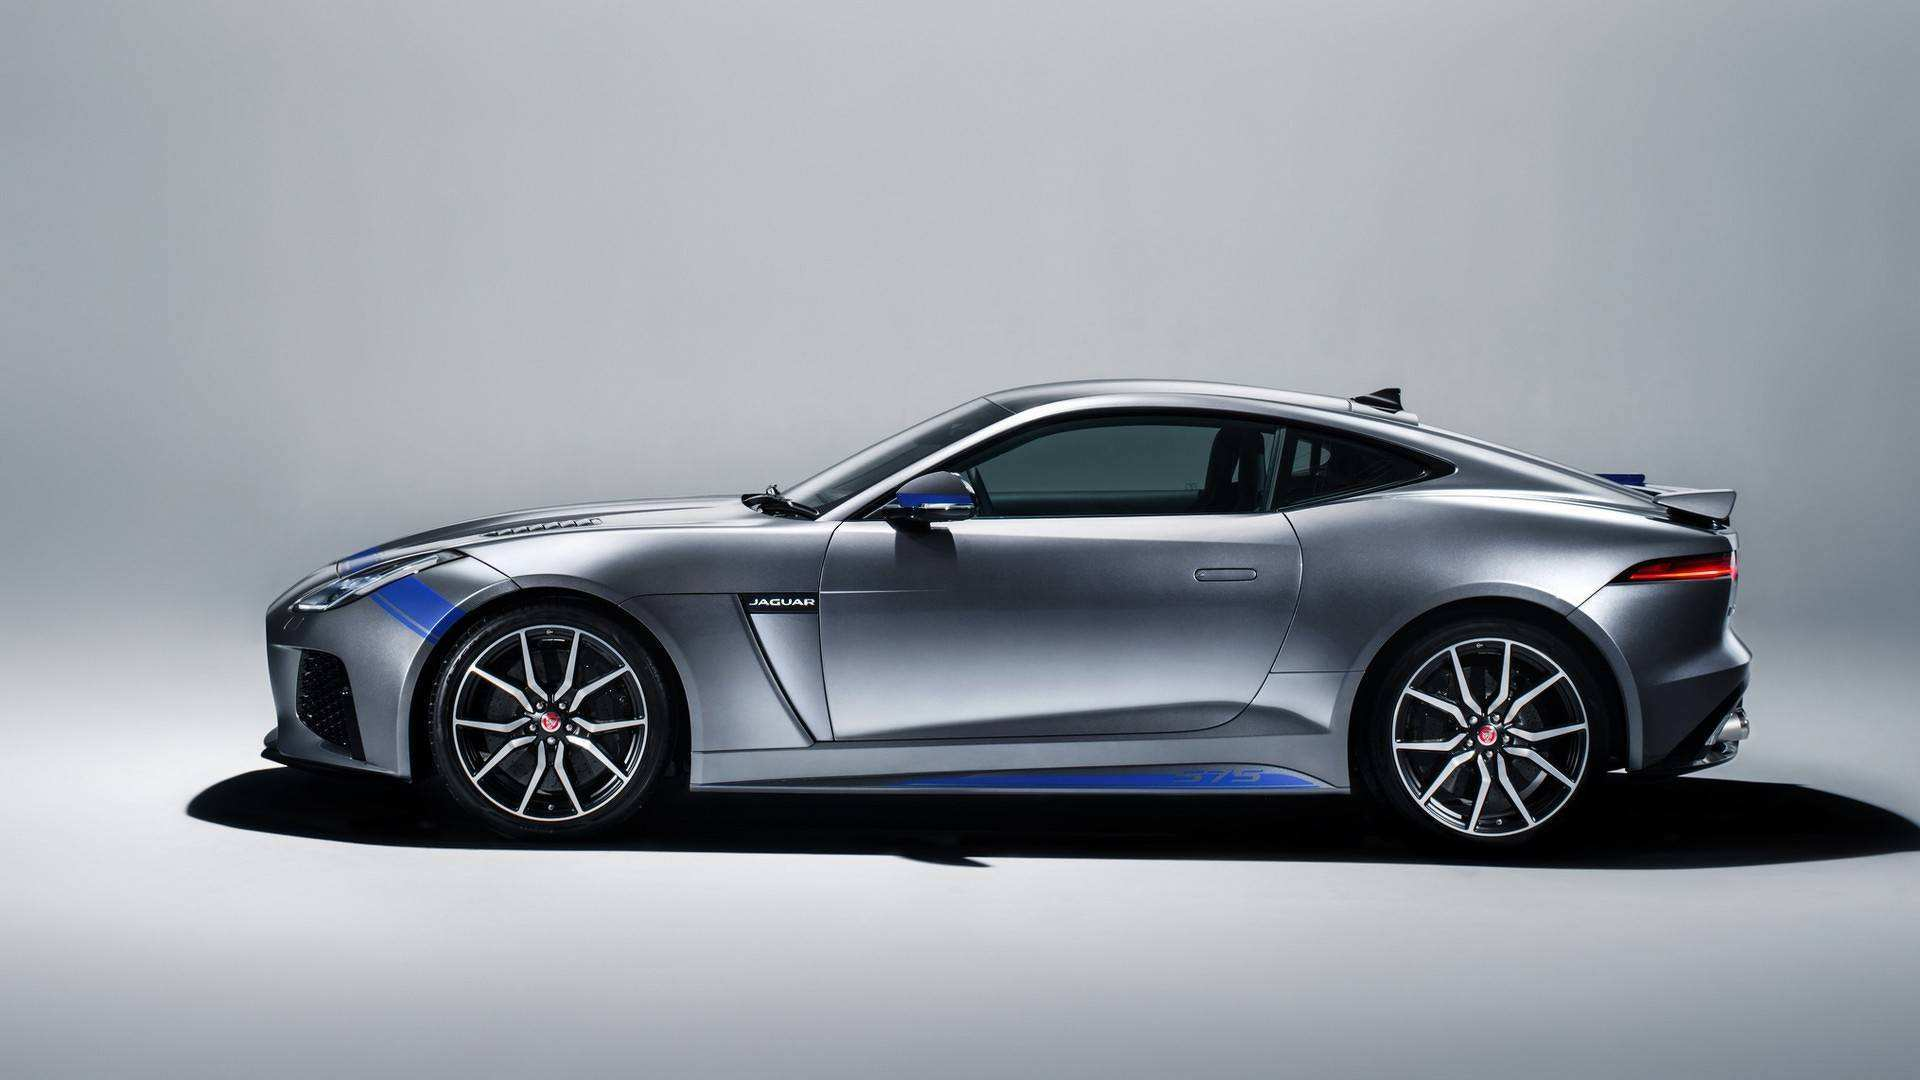 68 New 2020 Jaguar J Type Model with 2020 Jaguar J Type